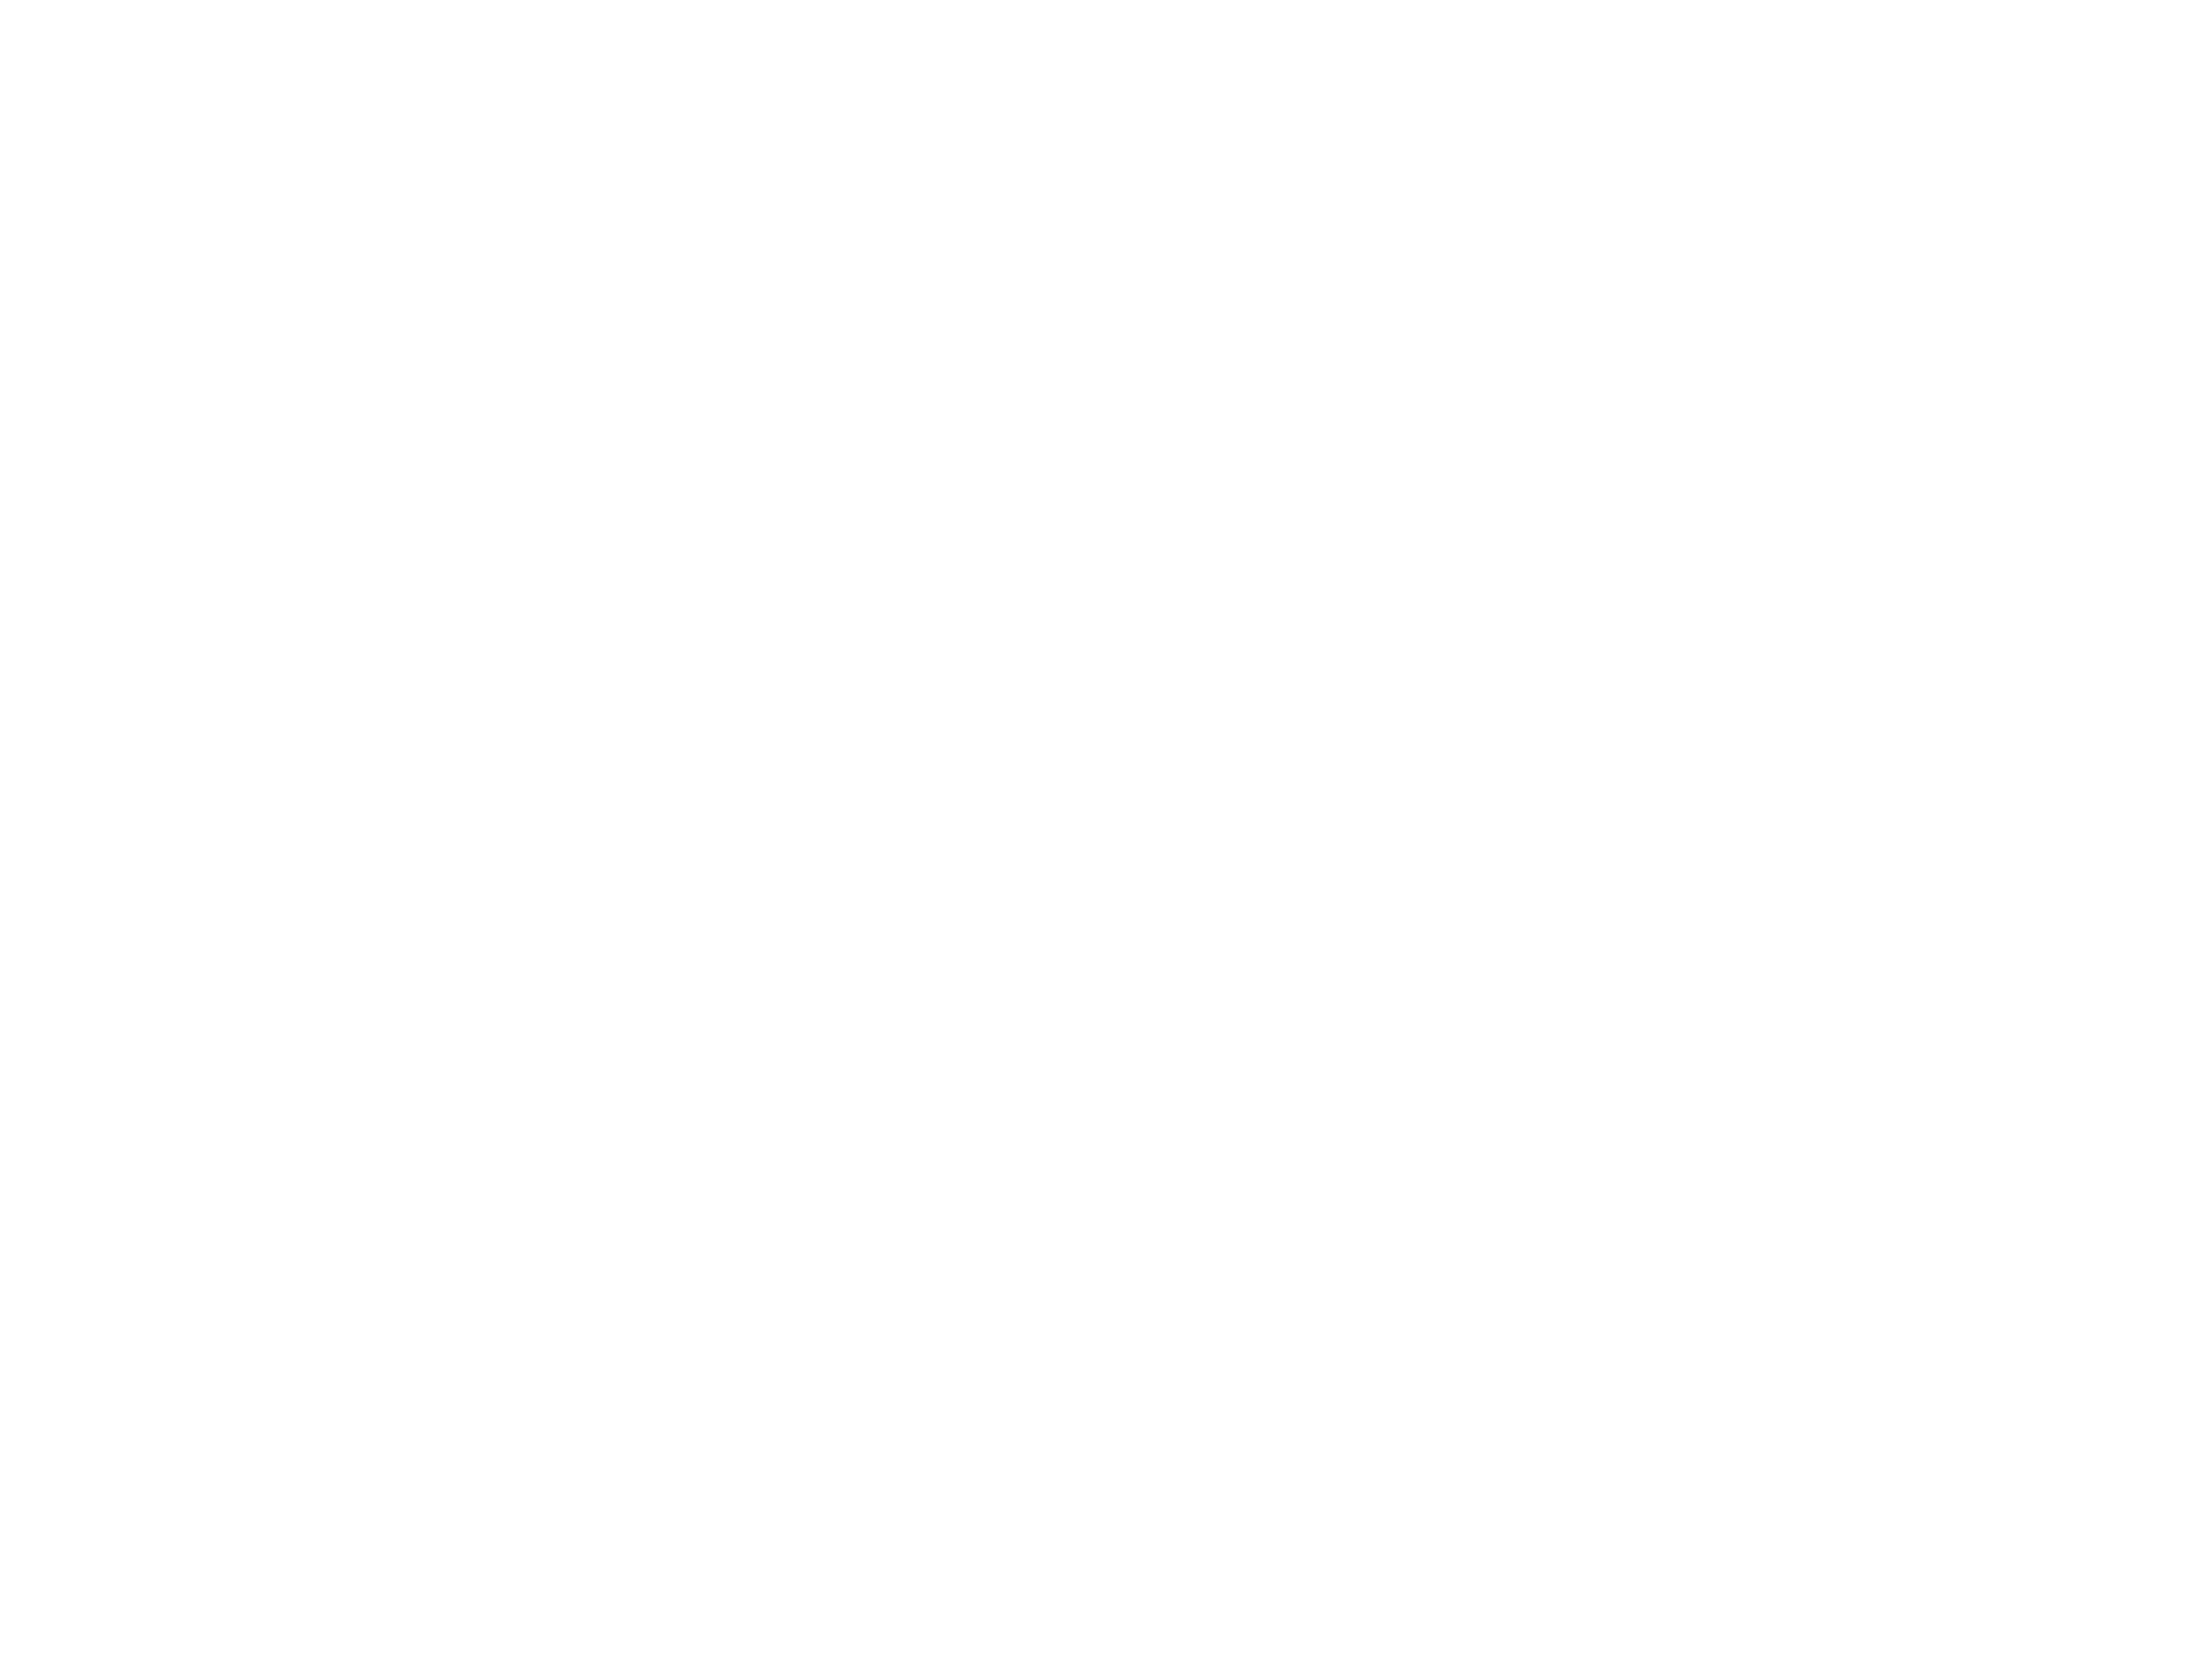 Sketchdarling